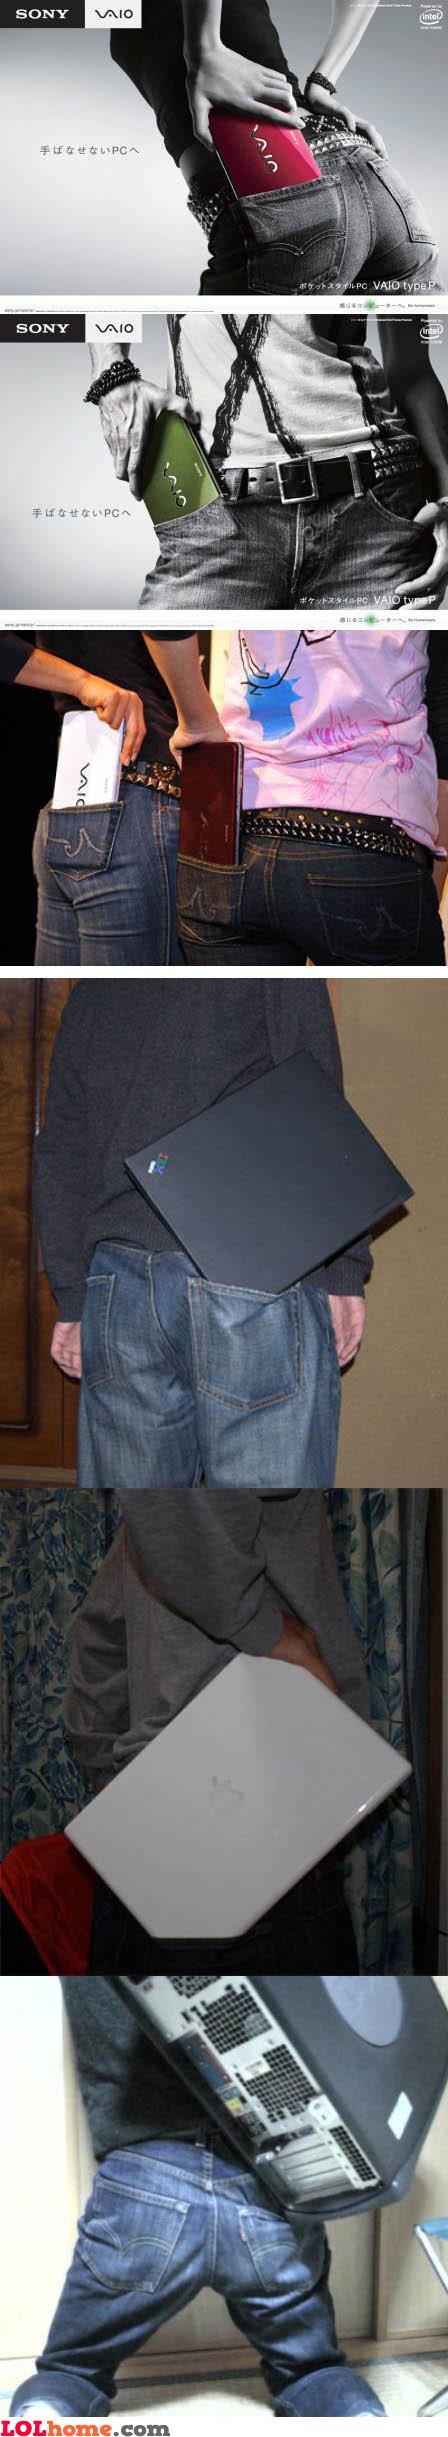 Laptop in my pocket